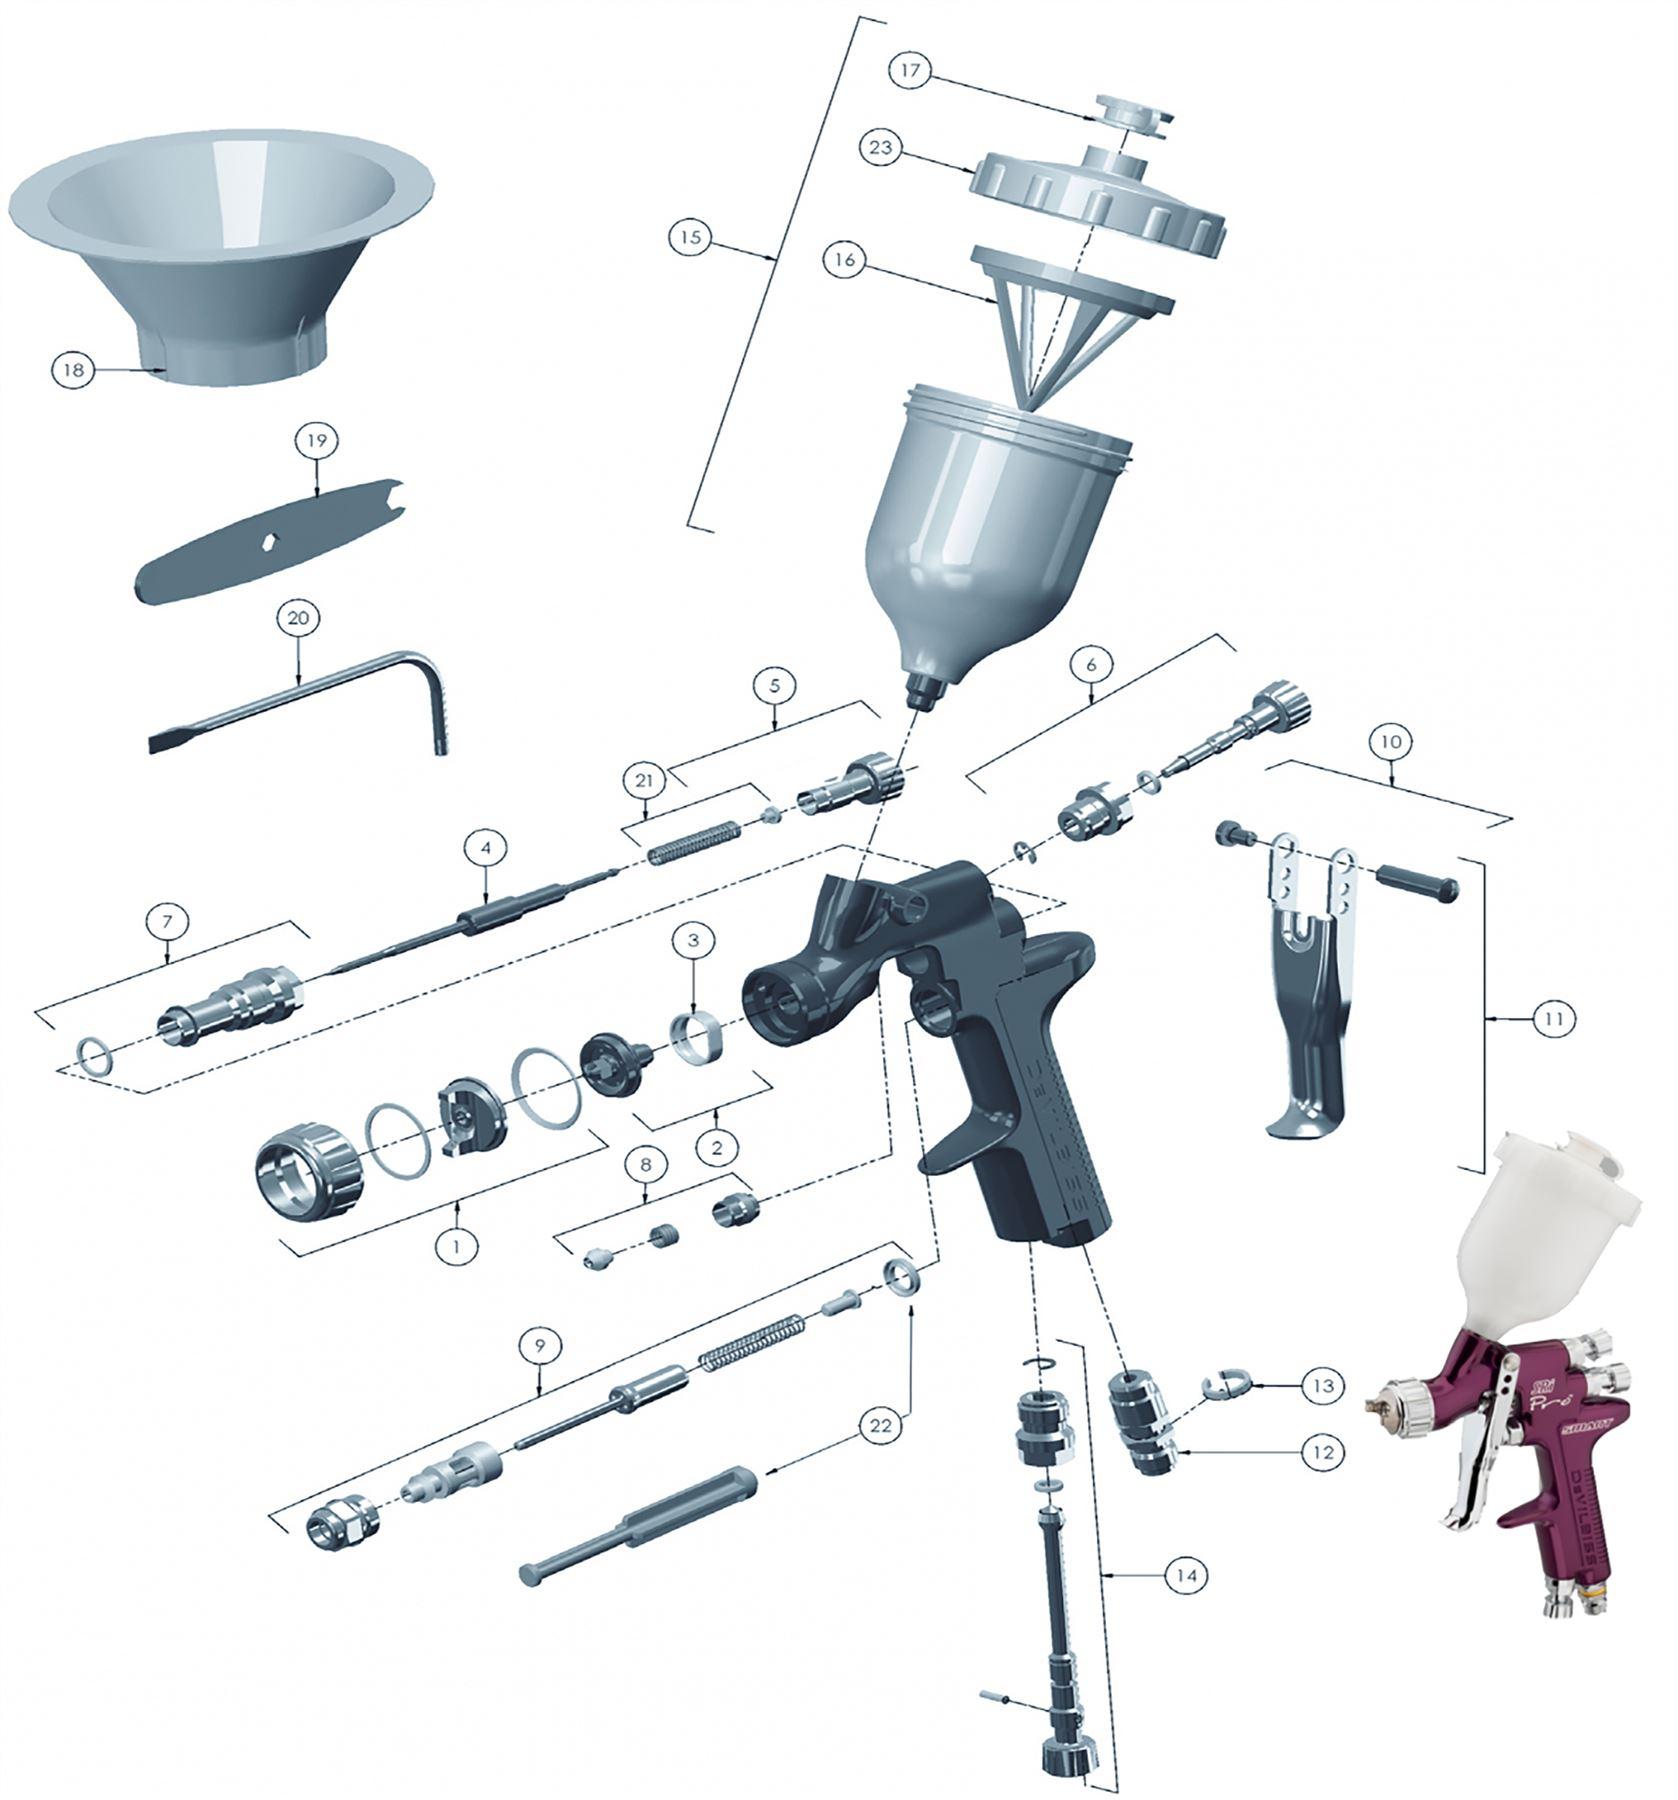 devilbiss spray gun parts diagram johnson 115 outboard wiring gti